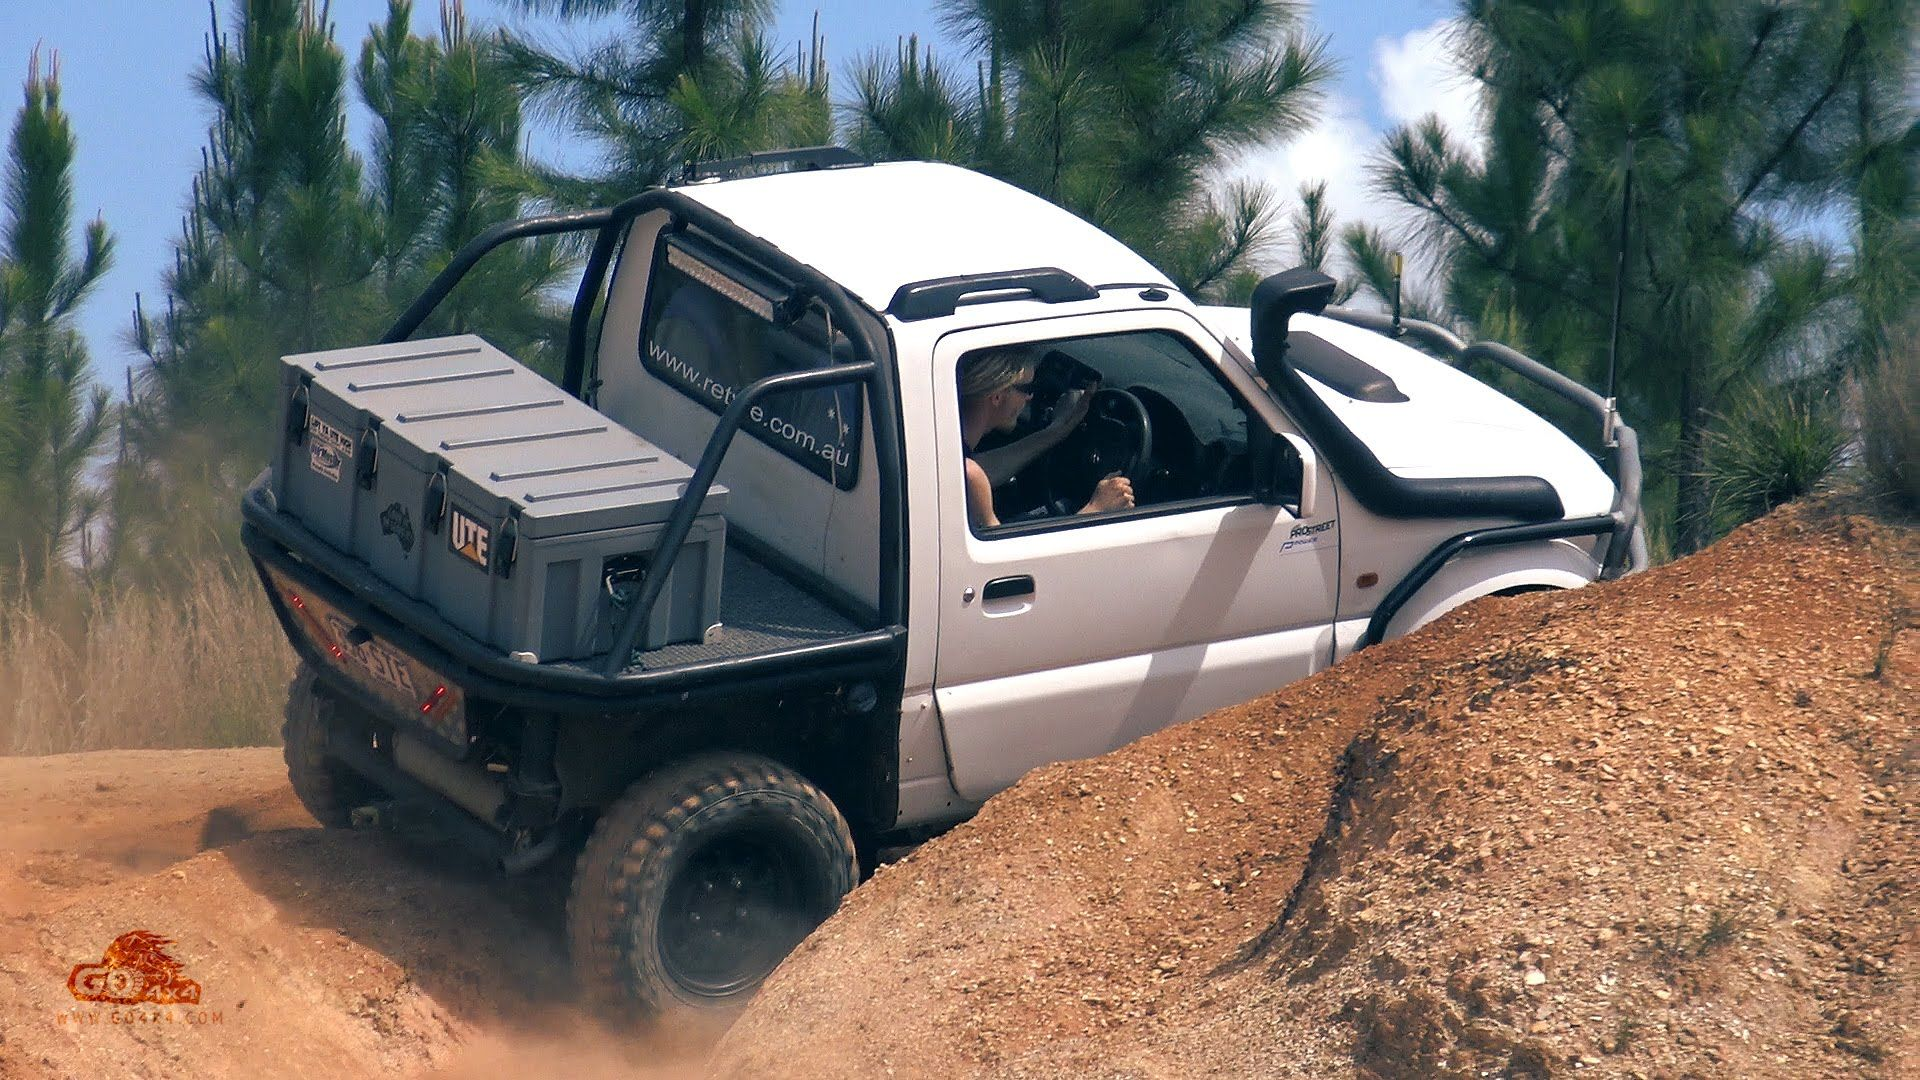 Modified Suzuki Jimny Offroading Custom Ute Zook 4wd 4x4 Suzuki Jimny Suzuki Jeep Suv